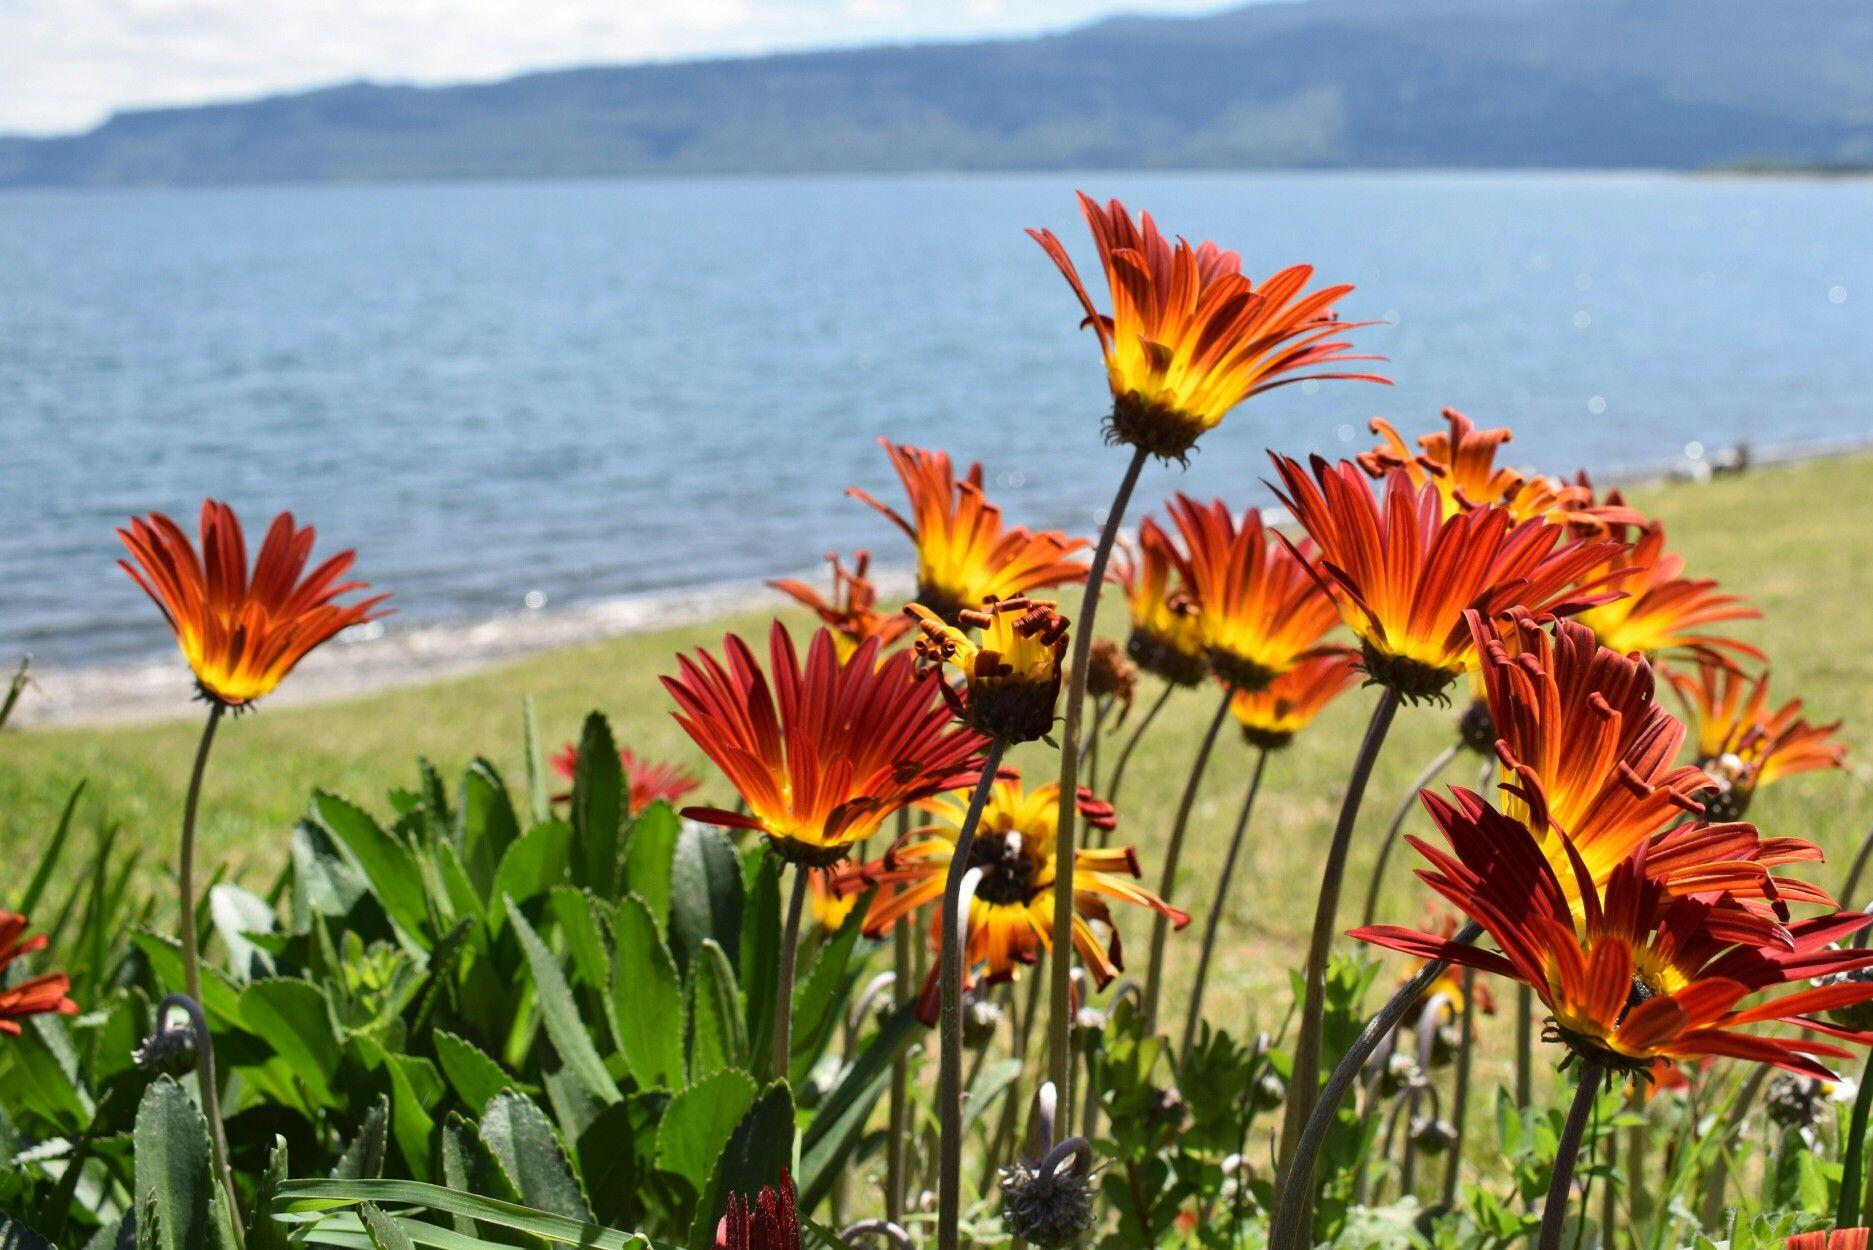 Lago Puyehue Osorno Hobbie Me Creo Fot Grafa Pinterest Lagos # Muebles Puyehue